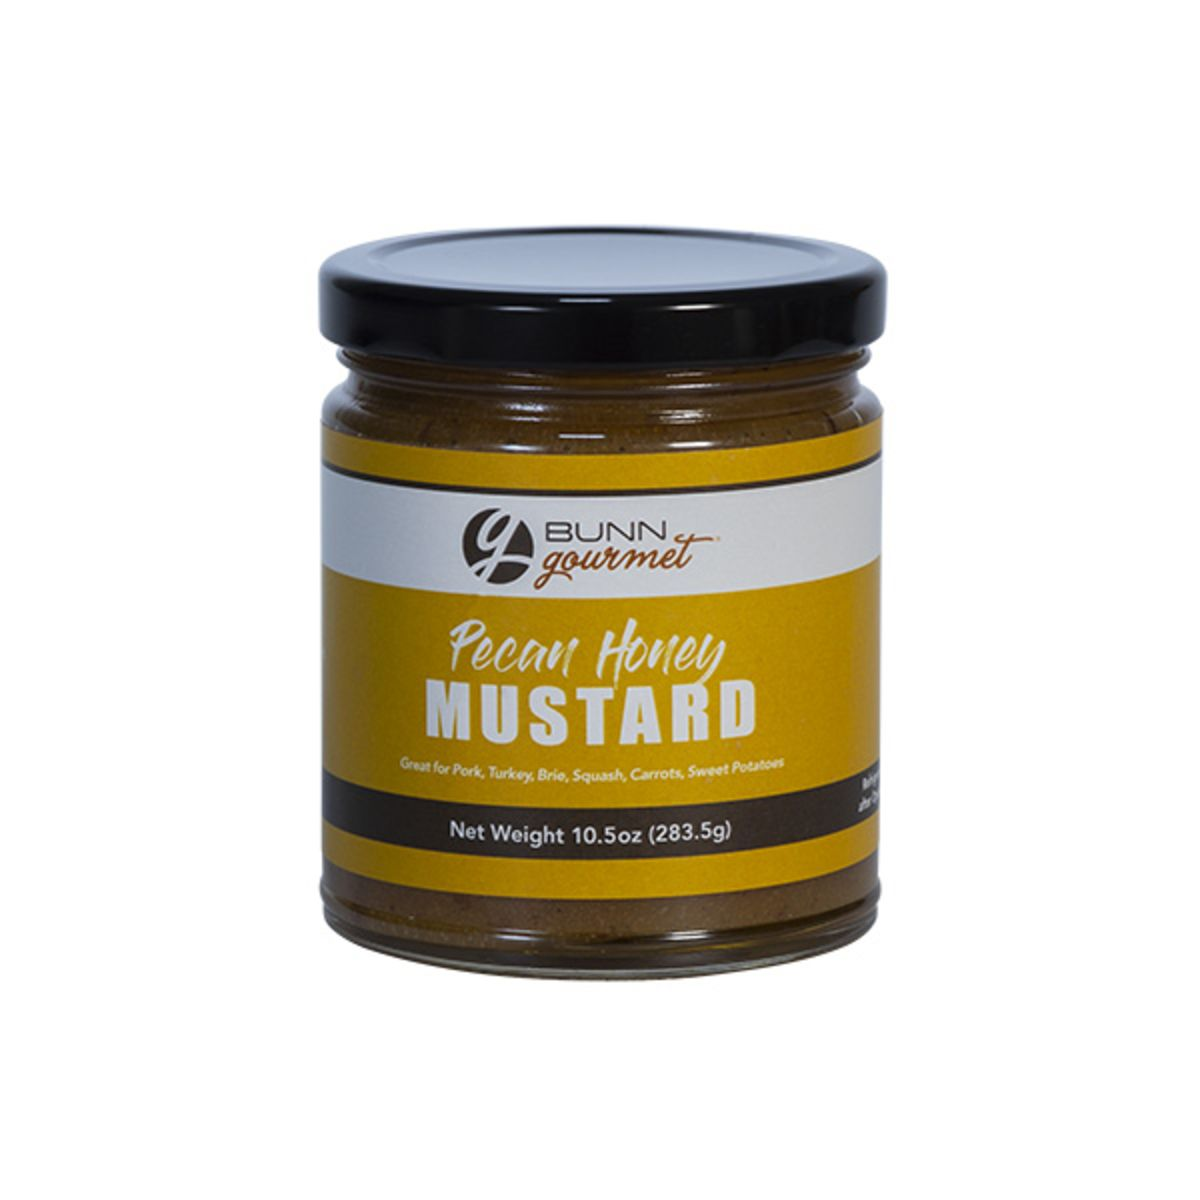 BUNN Gourmet Pecan Honey Mustard